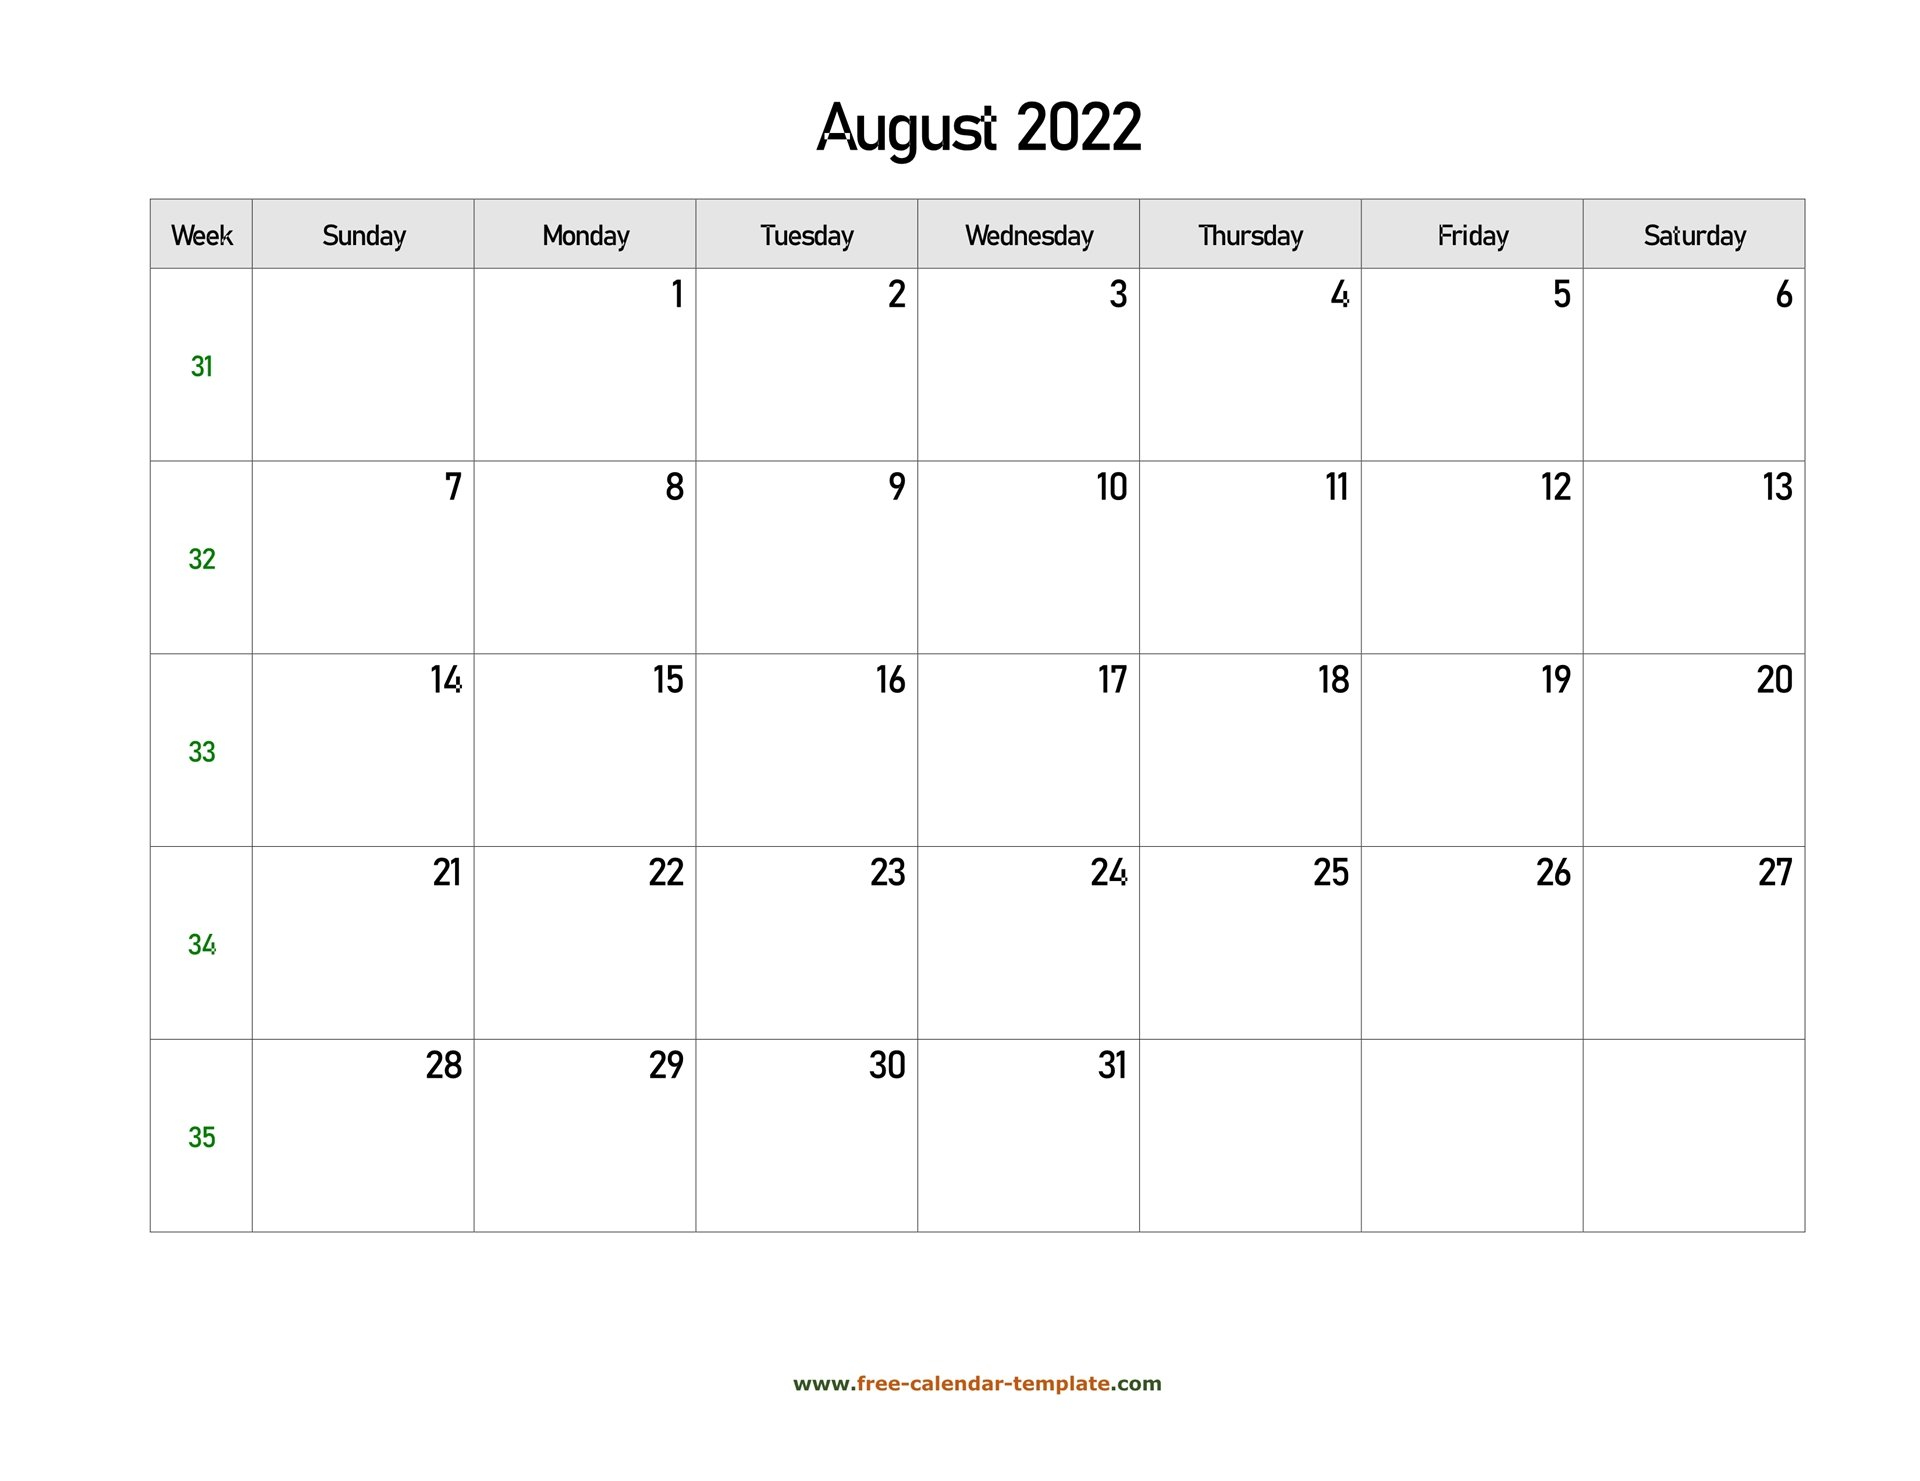 Free 2022 Calendar Blank August Template (Horizontal throughout Free Printable Calendar August 2022